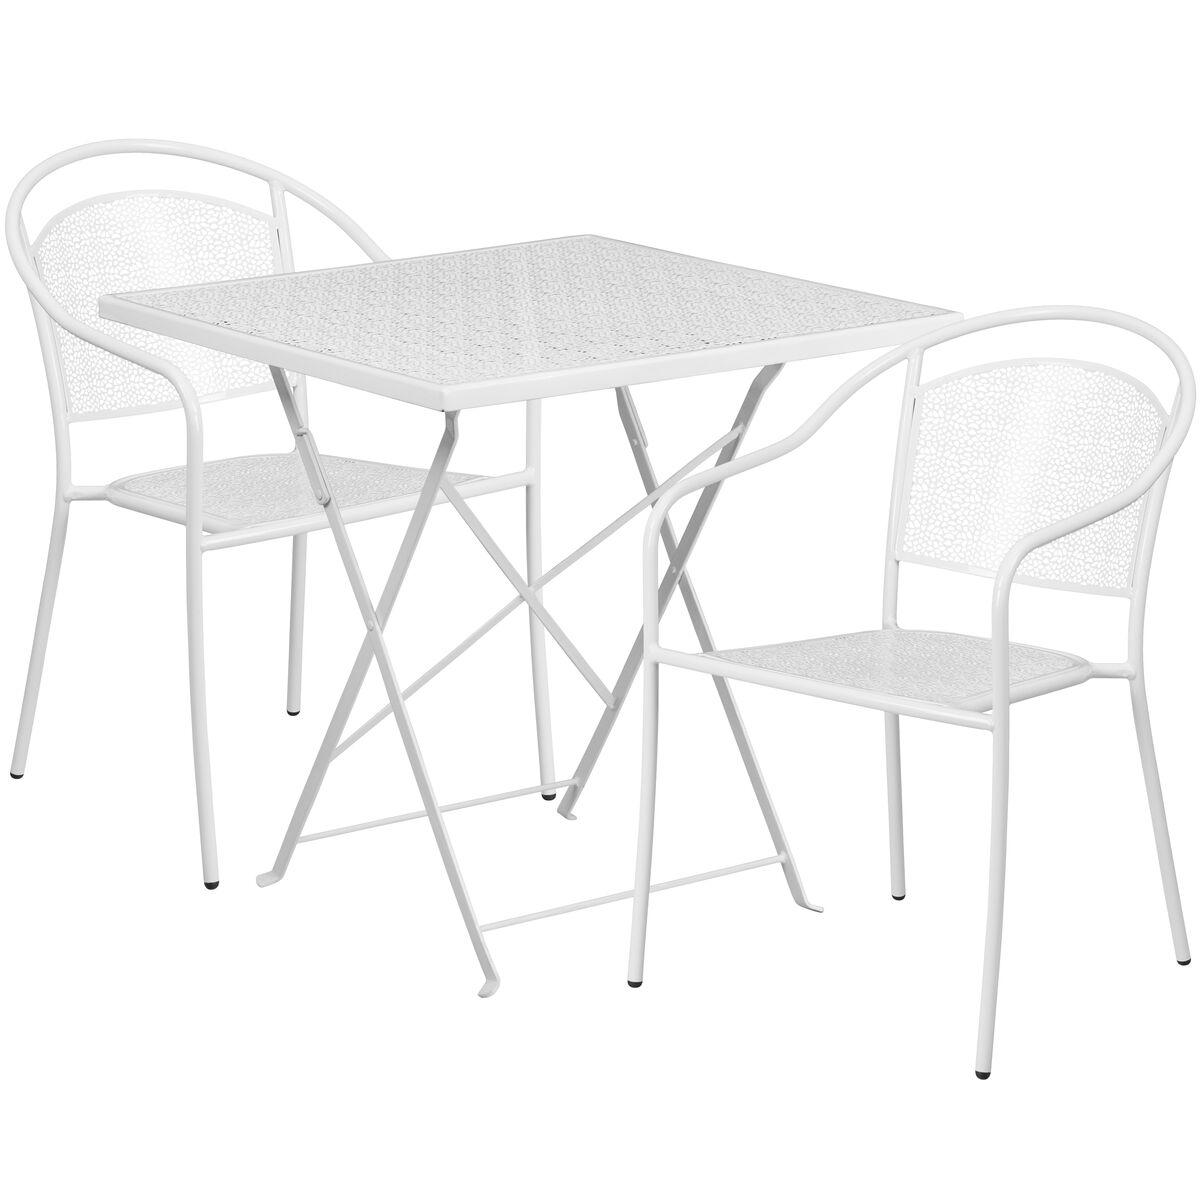 SQ White Fold Patio Set COSQFCHRWHGG FoldingChairsLesscom - Metal folding patio table and chairs